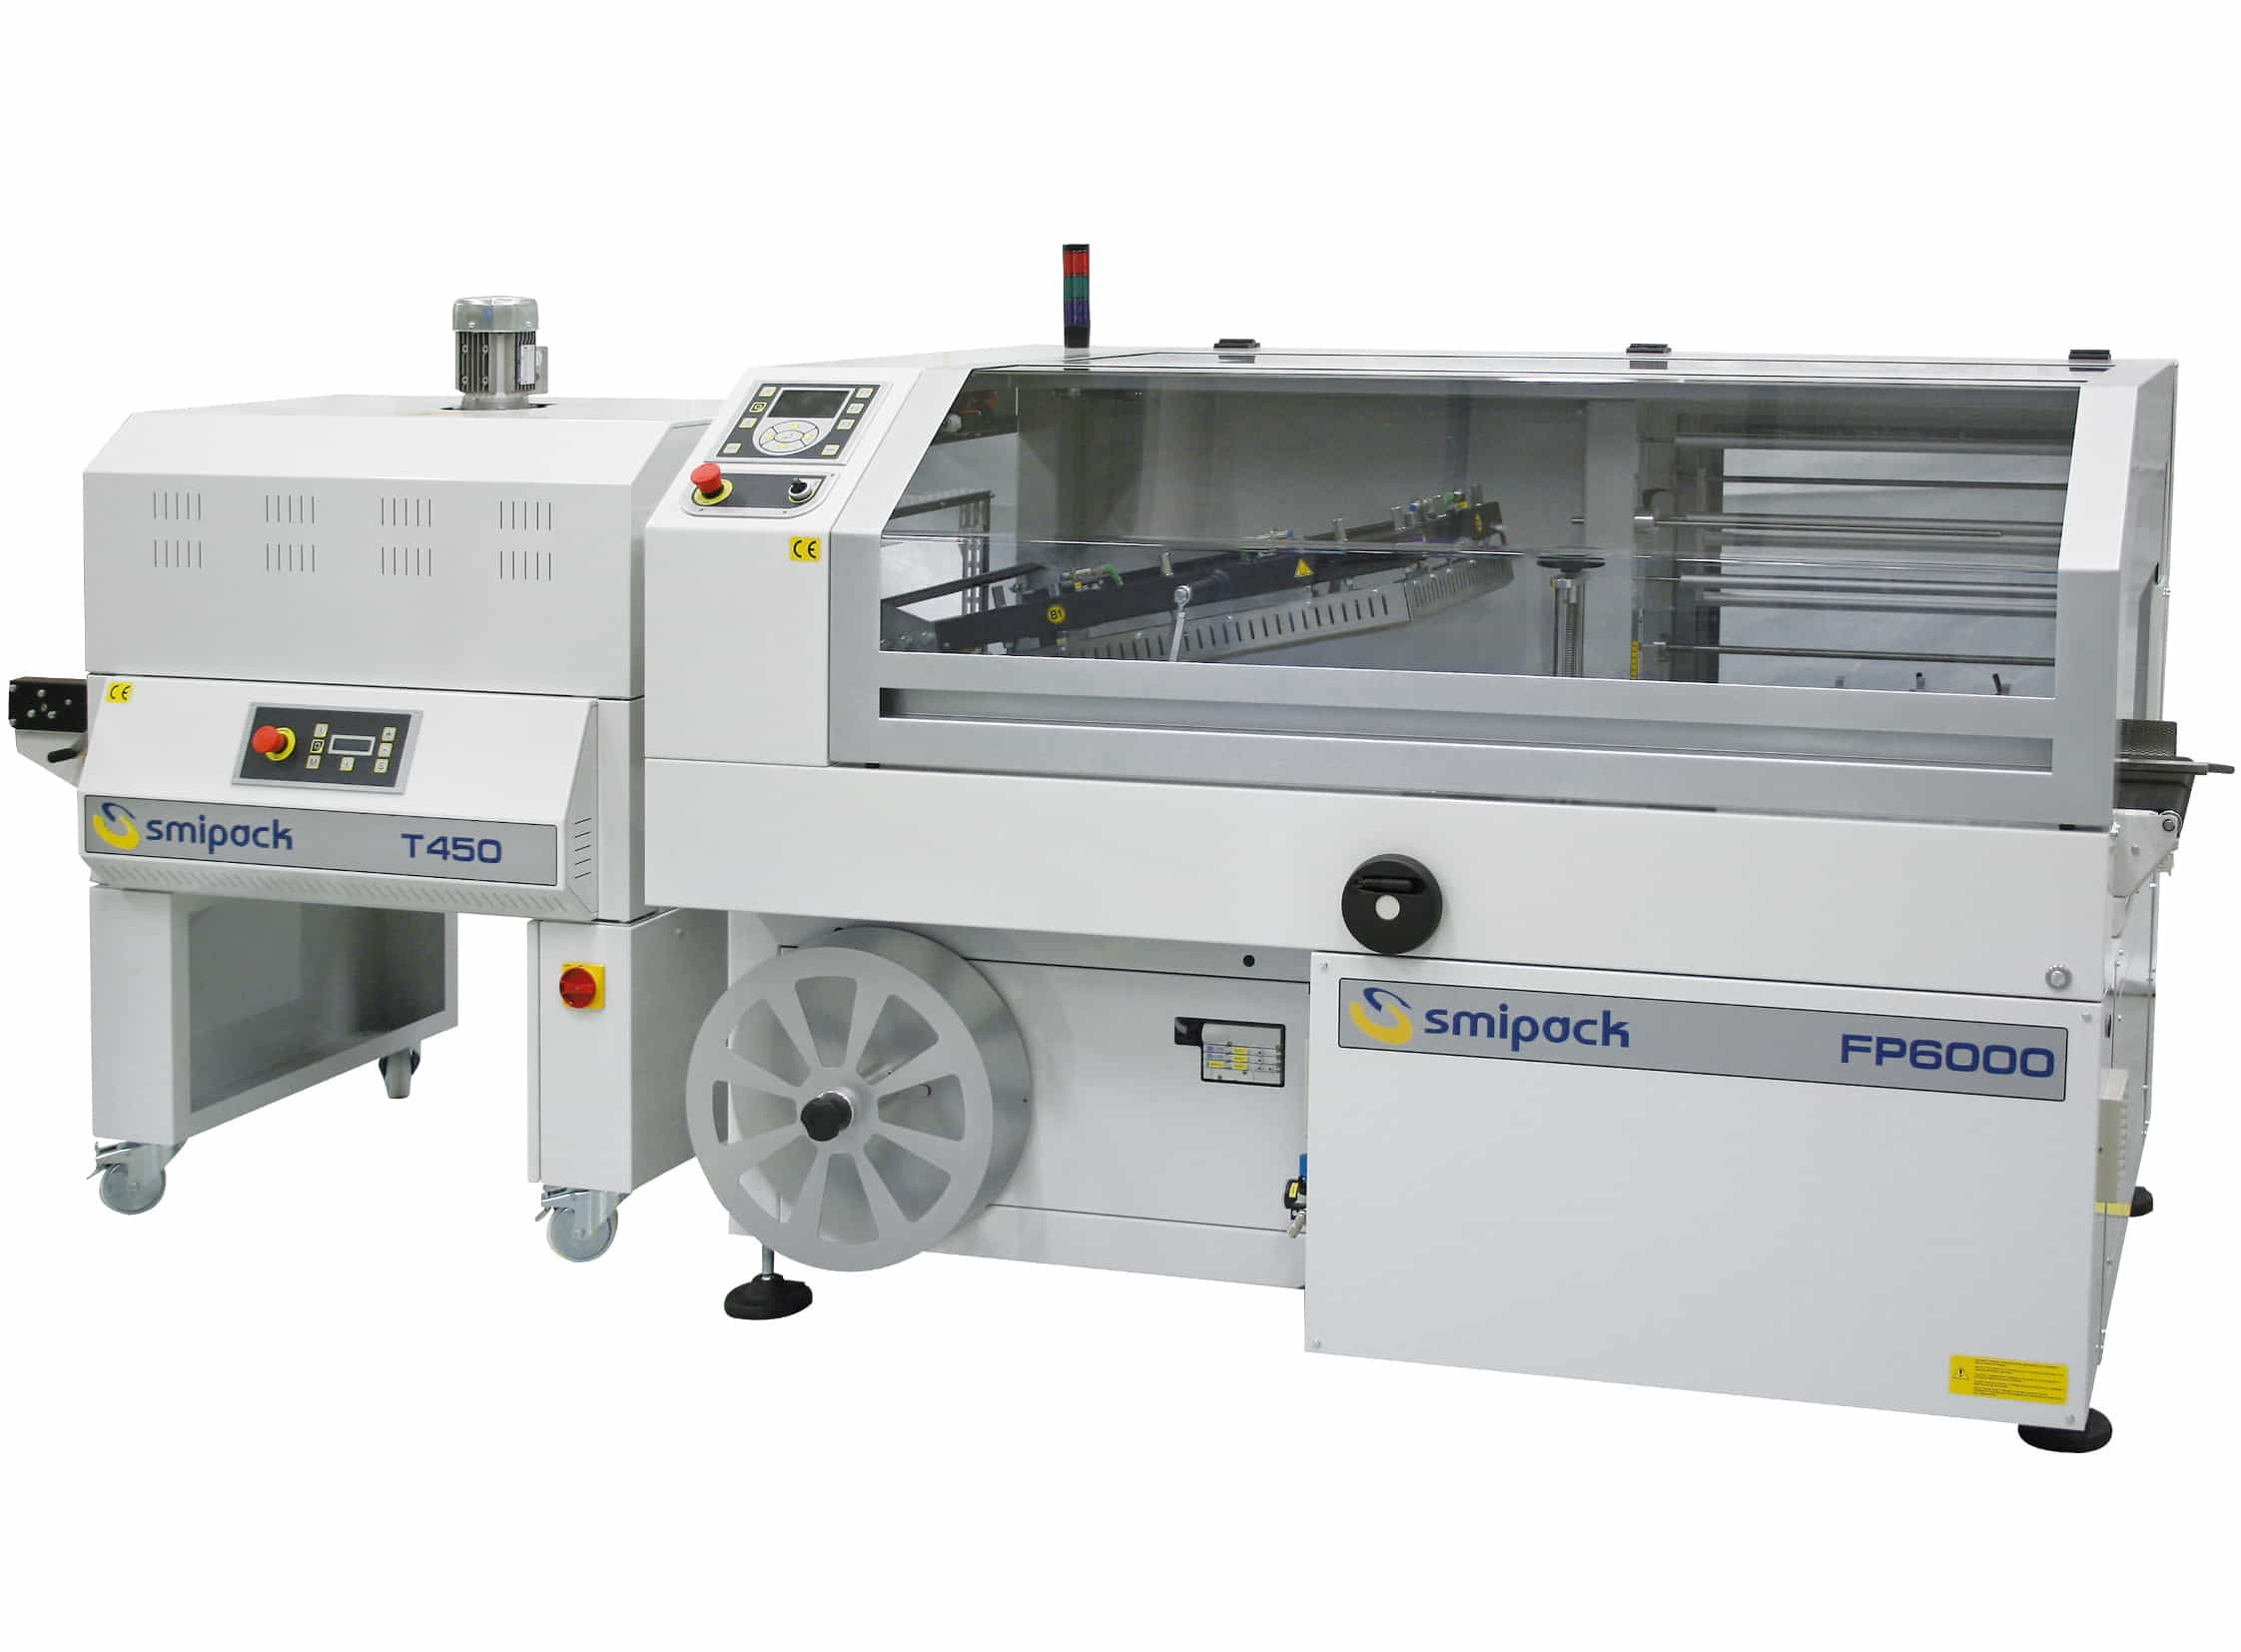 FP 6000